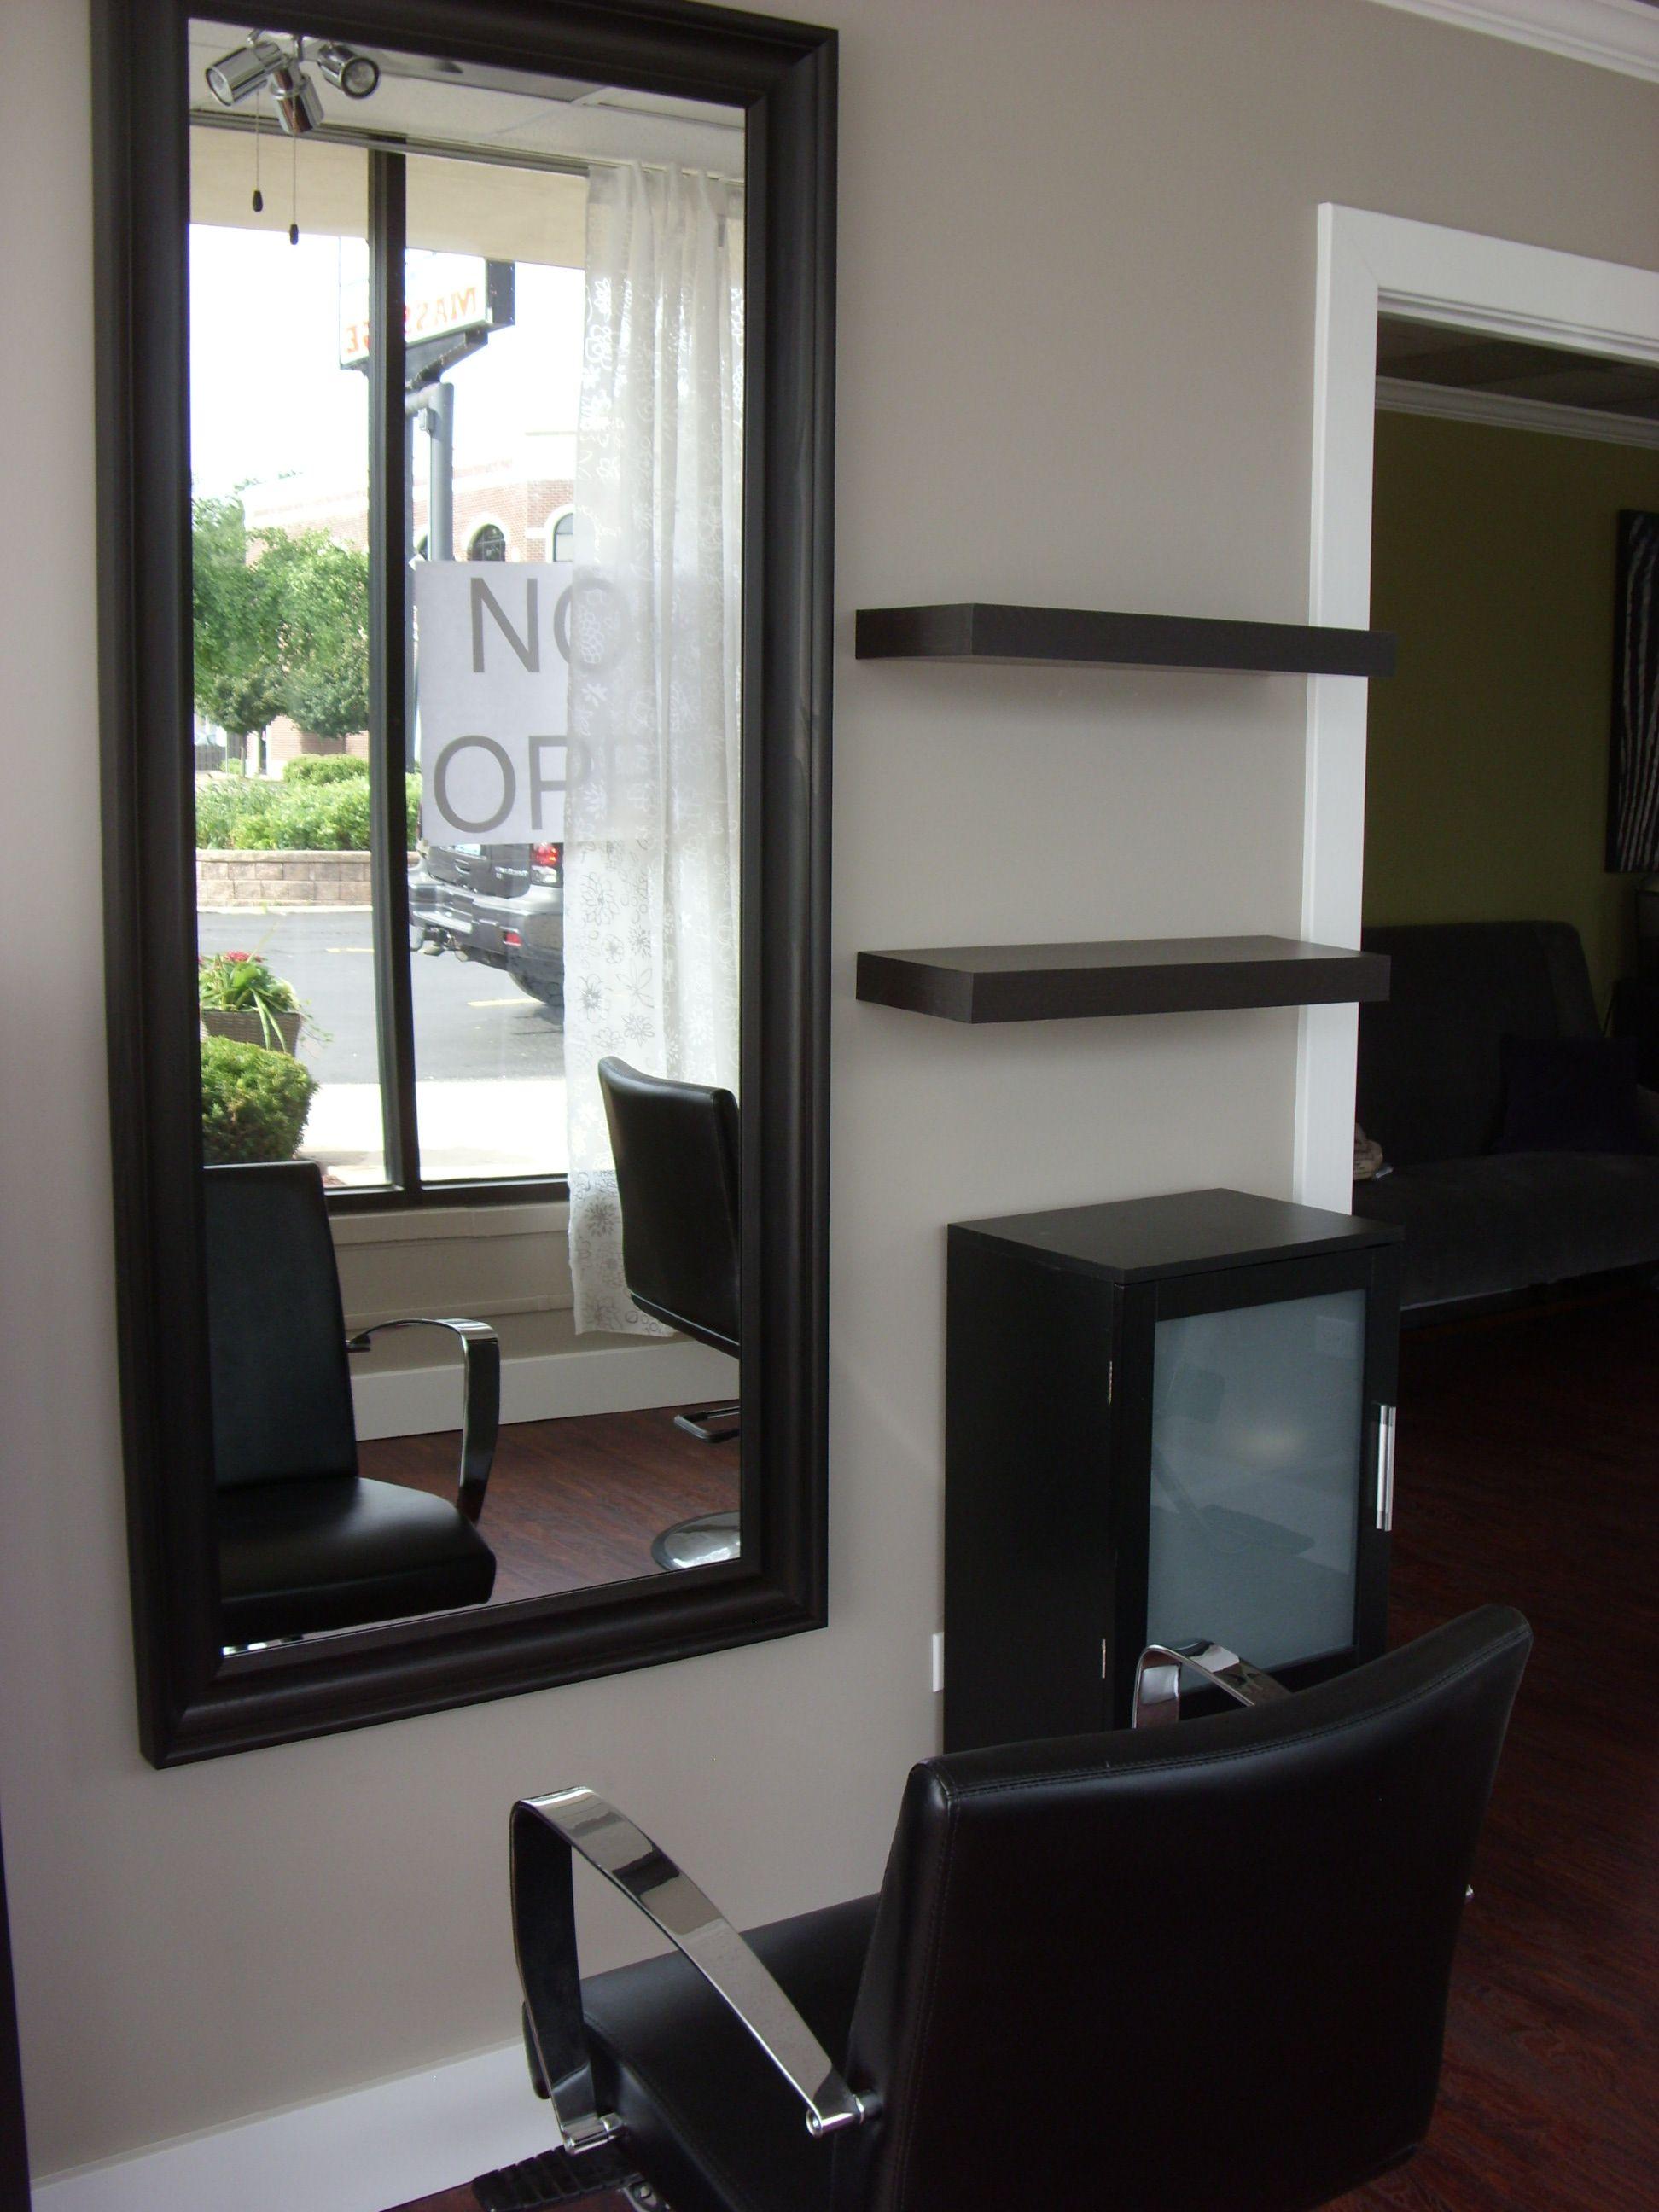 Salon Suite! Geneva, IL | Mobbela Salon Suite | Pinterest | Geneva ...